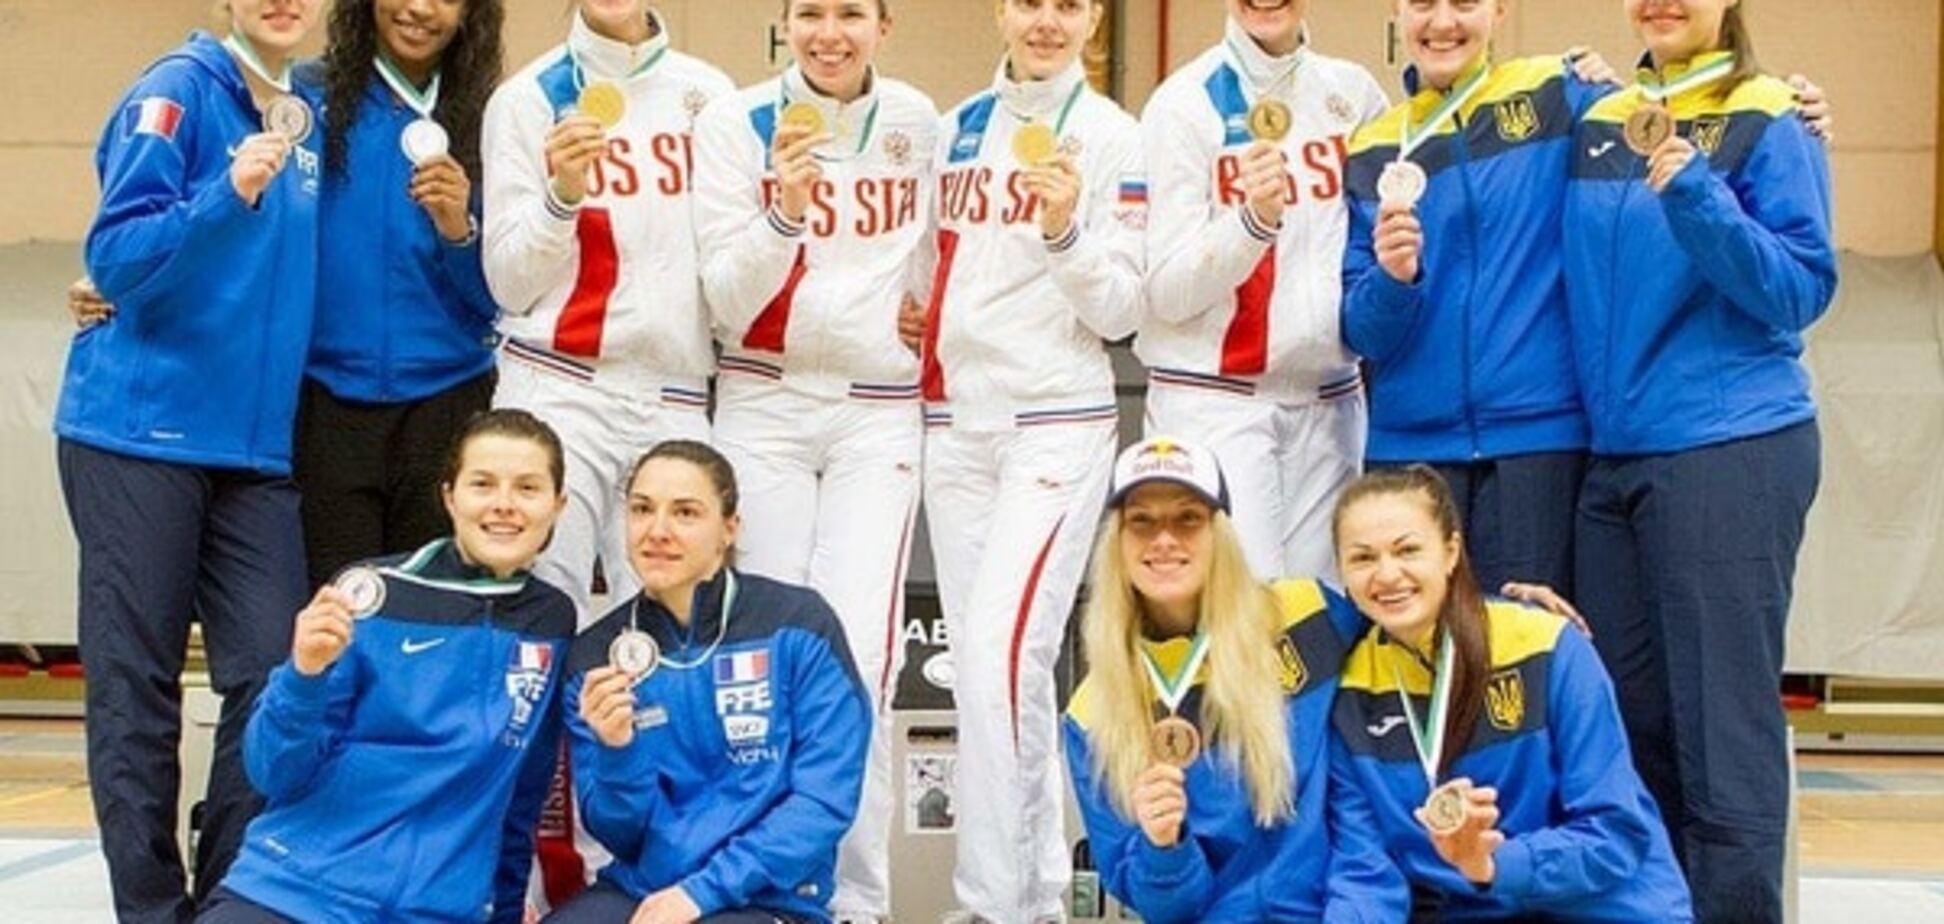 Збірна України виграла медаль і Олімпійську ліцензію